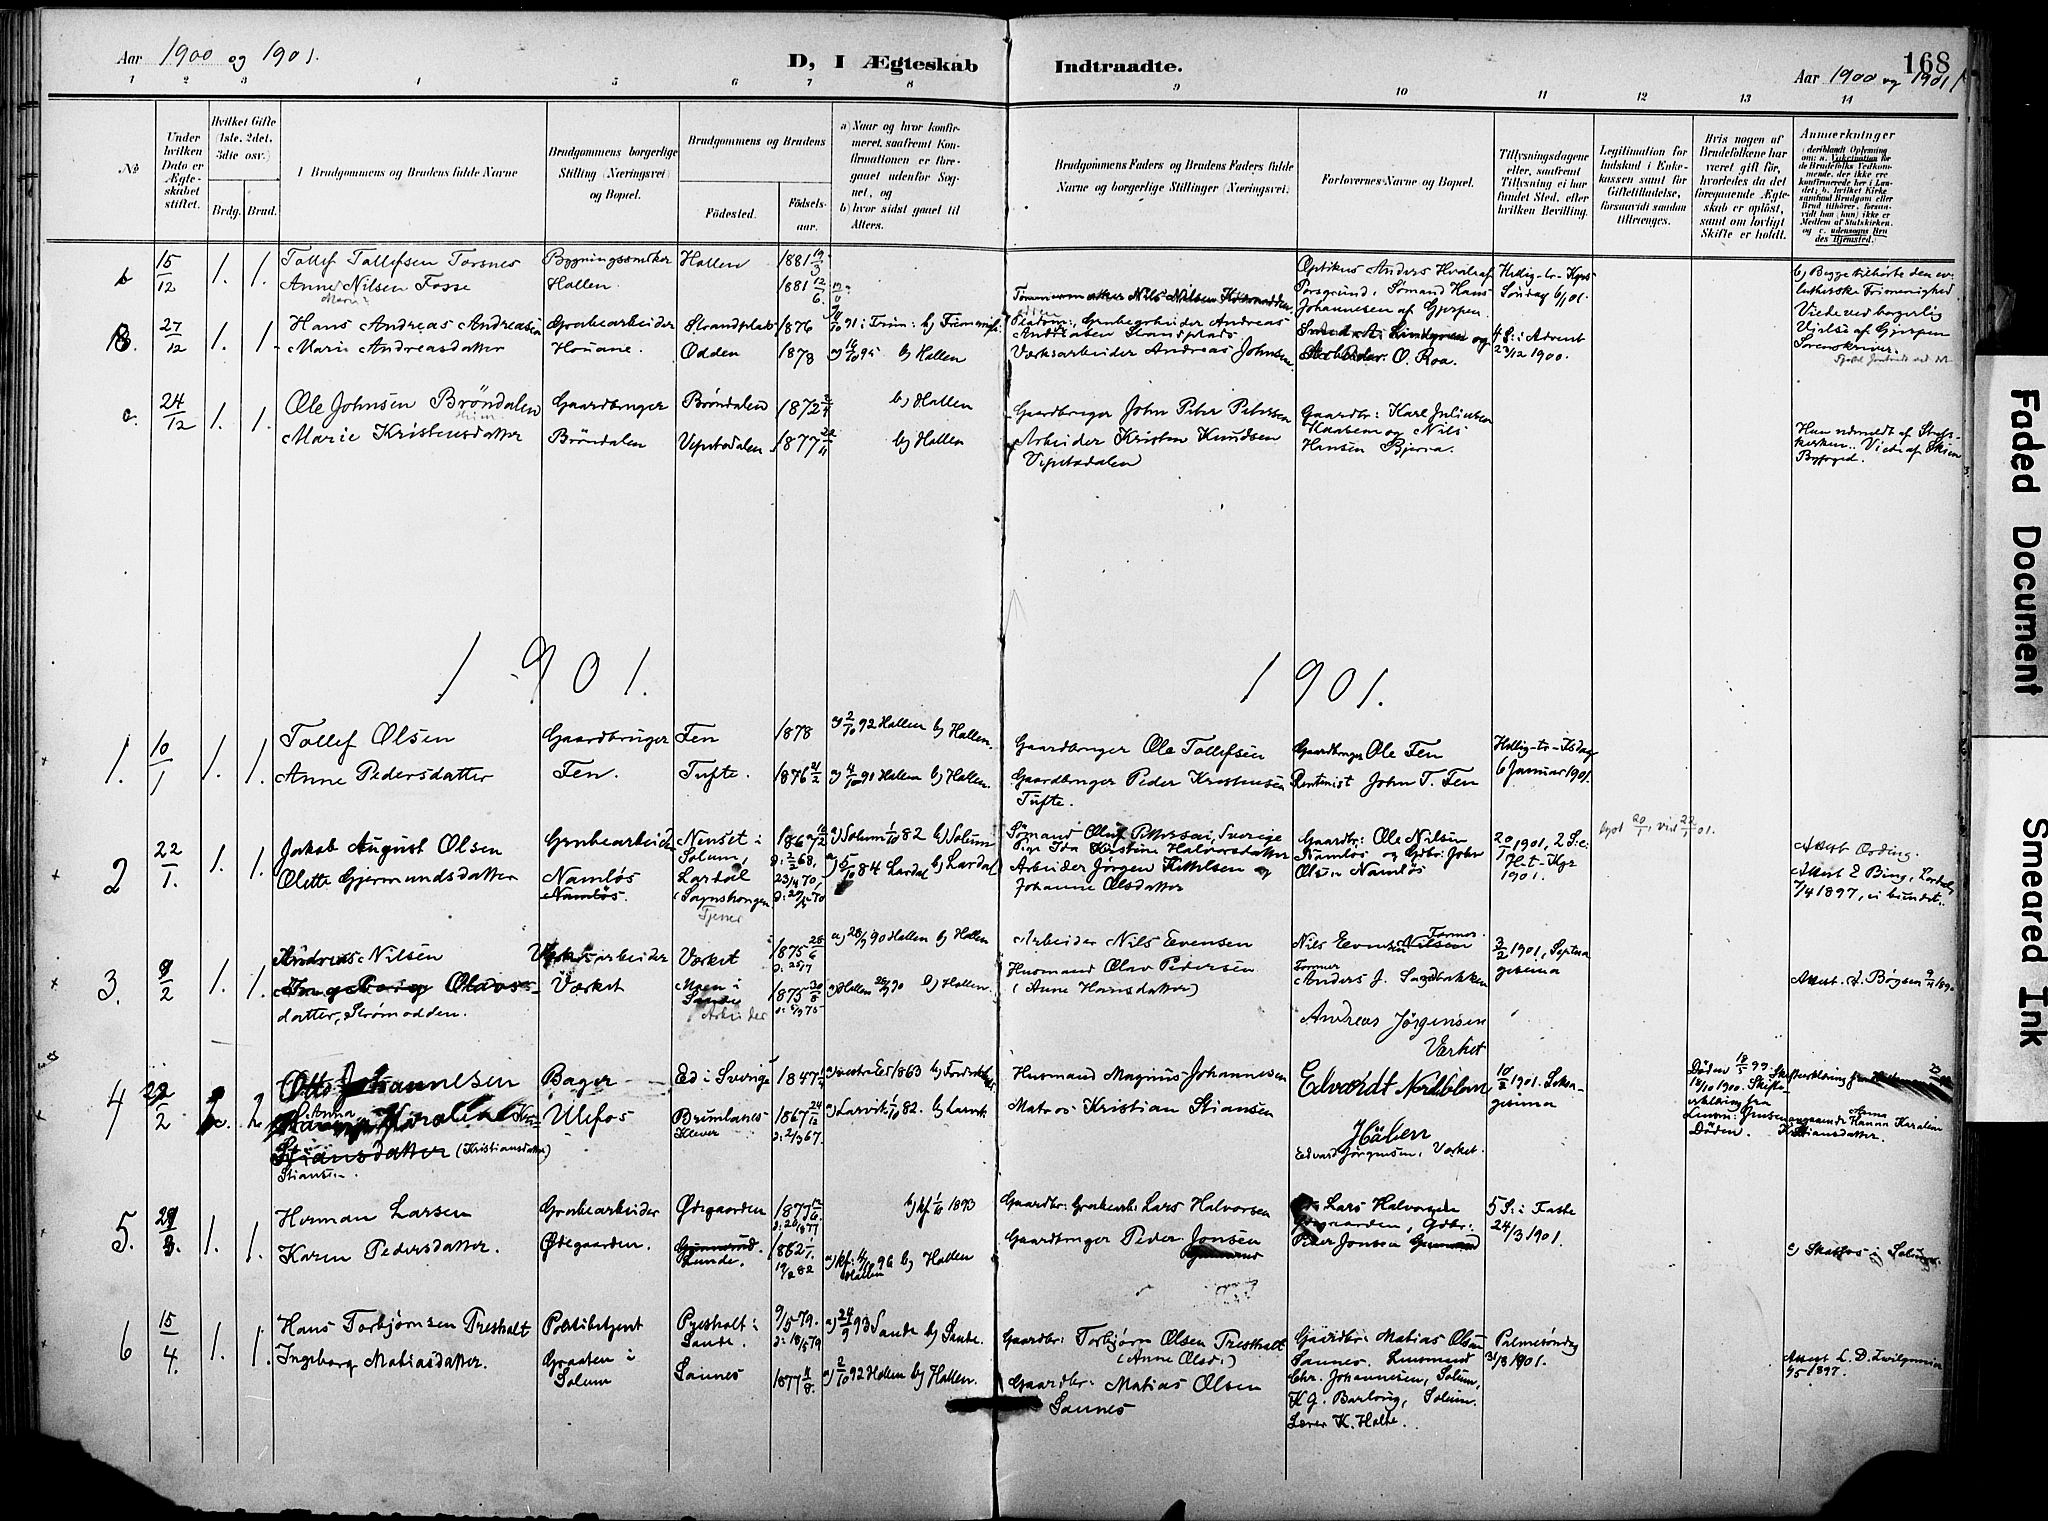 SAKO, Holla kirkebøker, F/Fa/L0010: Ministerialbok nr. 10, 1897-1907, s. 168